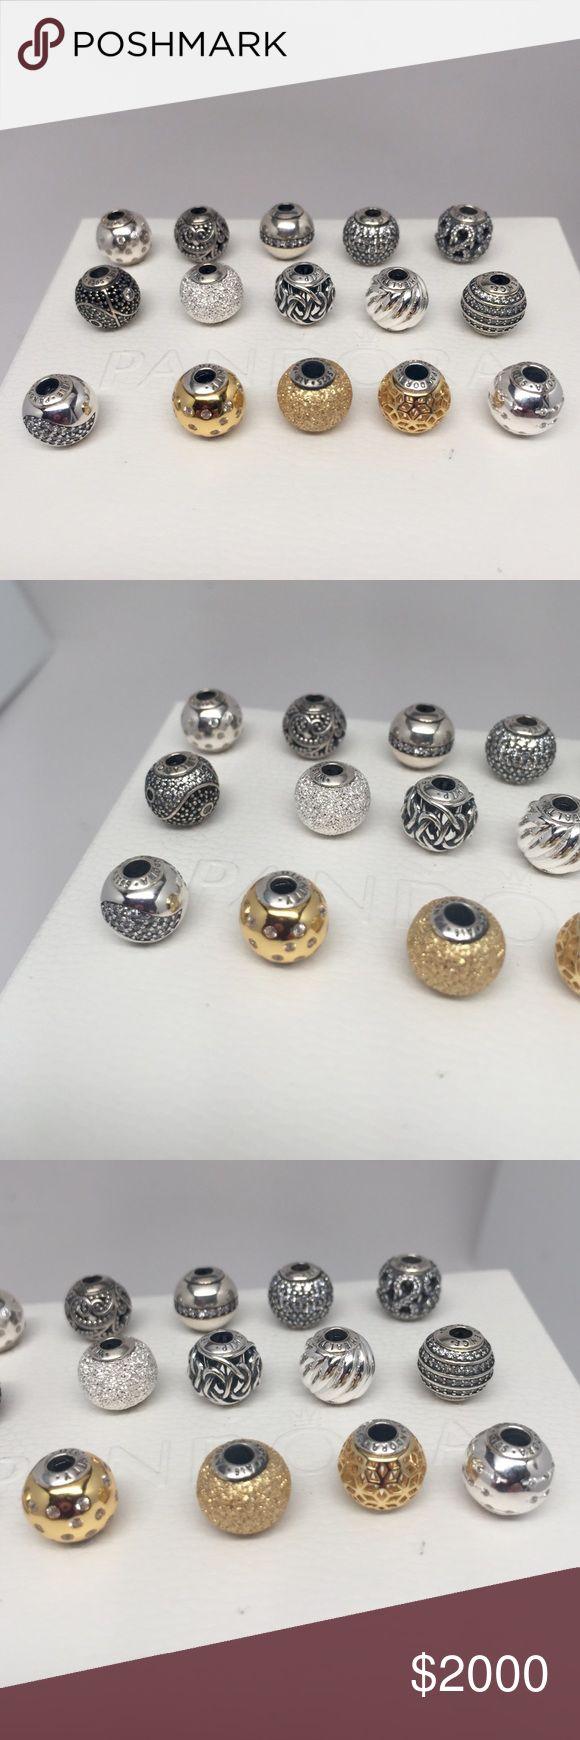 New Pandora Essence charms..make reasonable offer New gold and silver pandora essence bracelet charms. Will sell separately. All reasonable offers considered. Pandora Jewelry